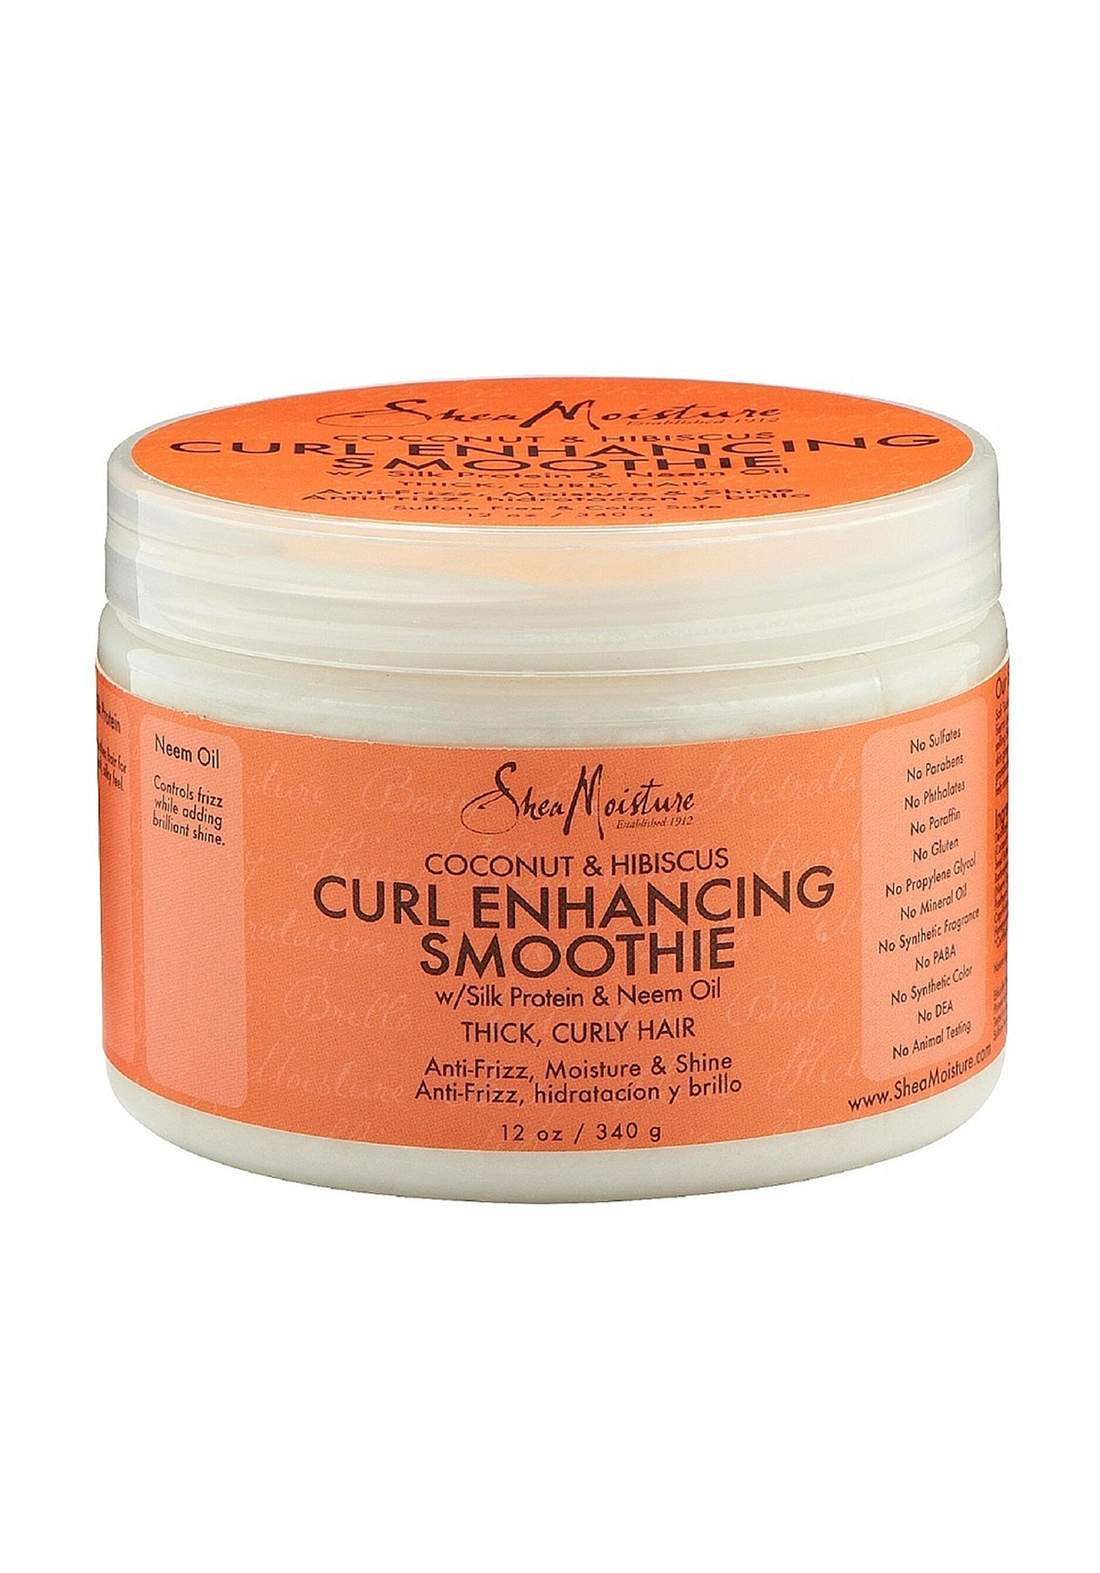 Shea Moisture Coconut & Hibiscus Curl Enhancing Smoothieمرطب للشعر